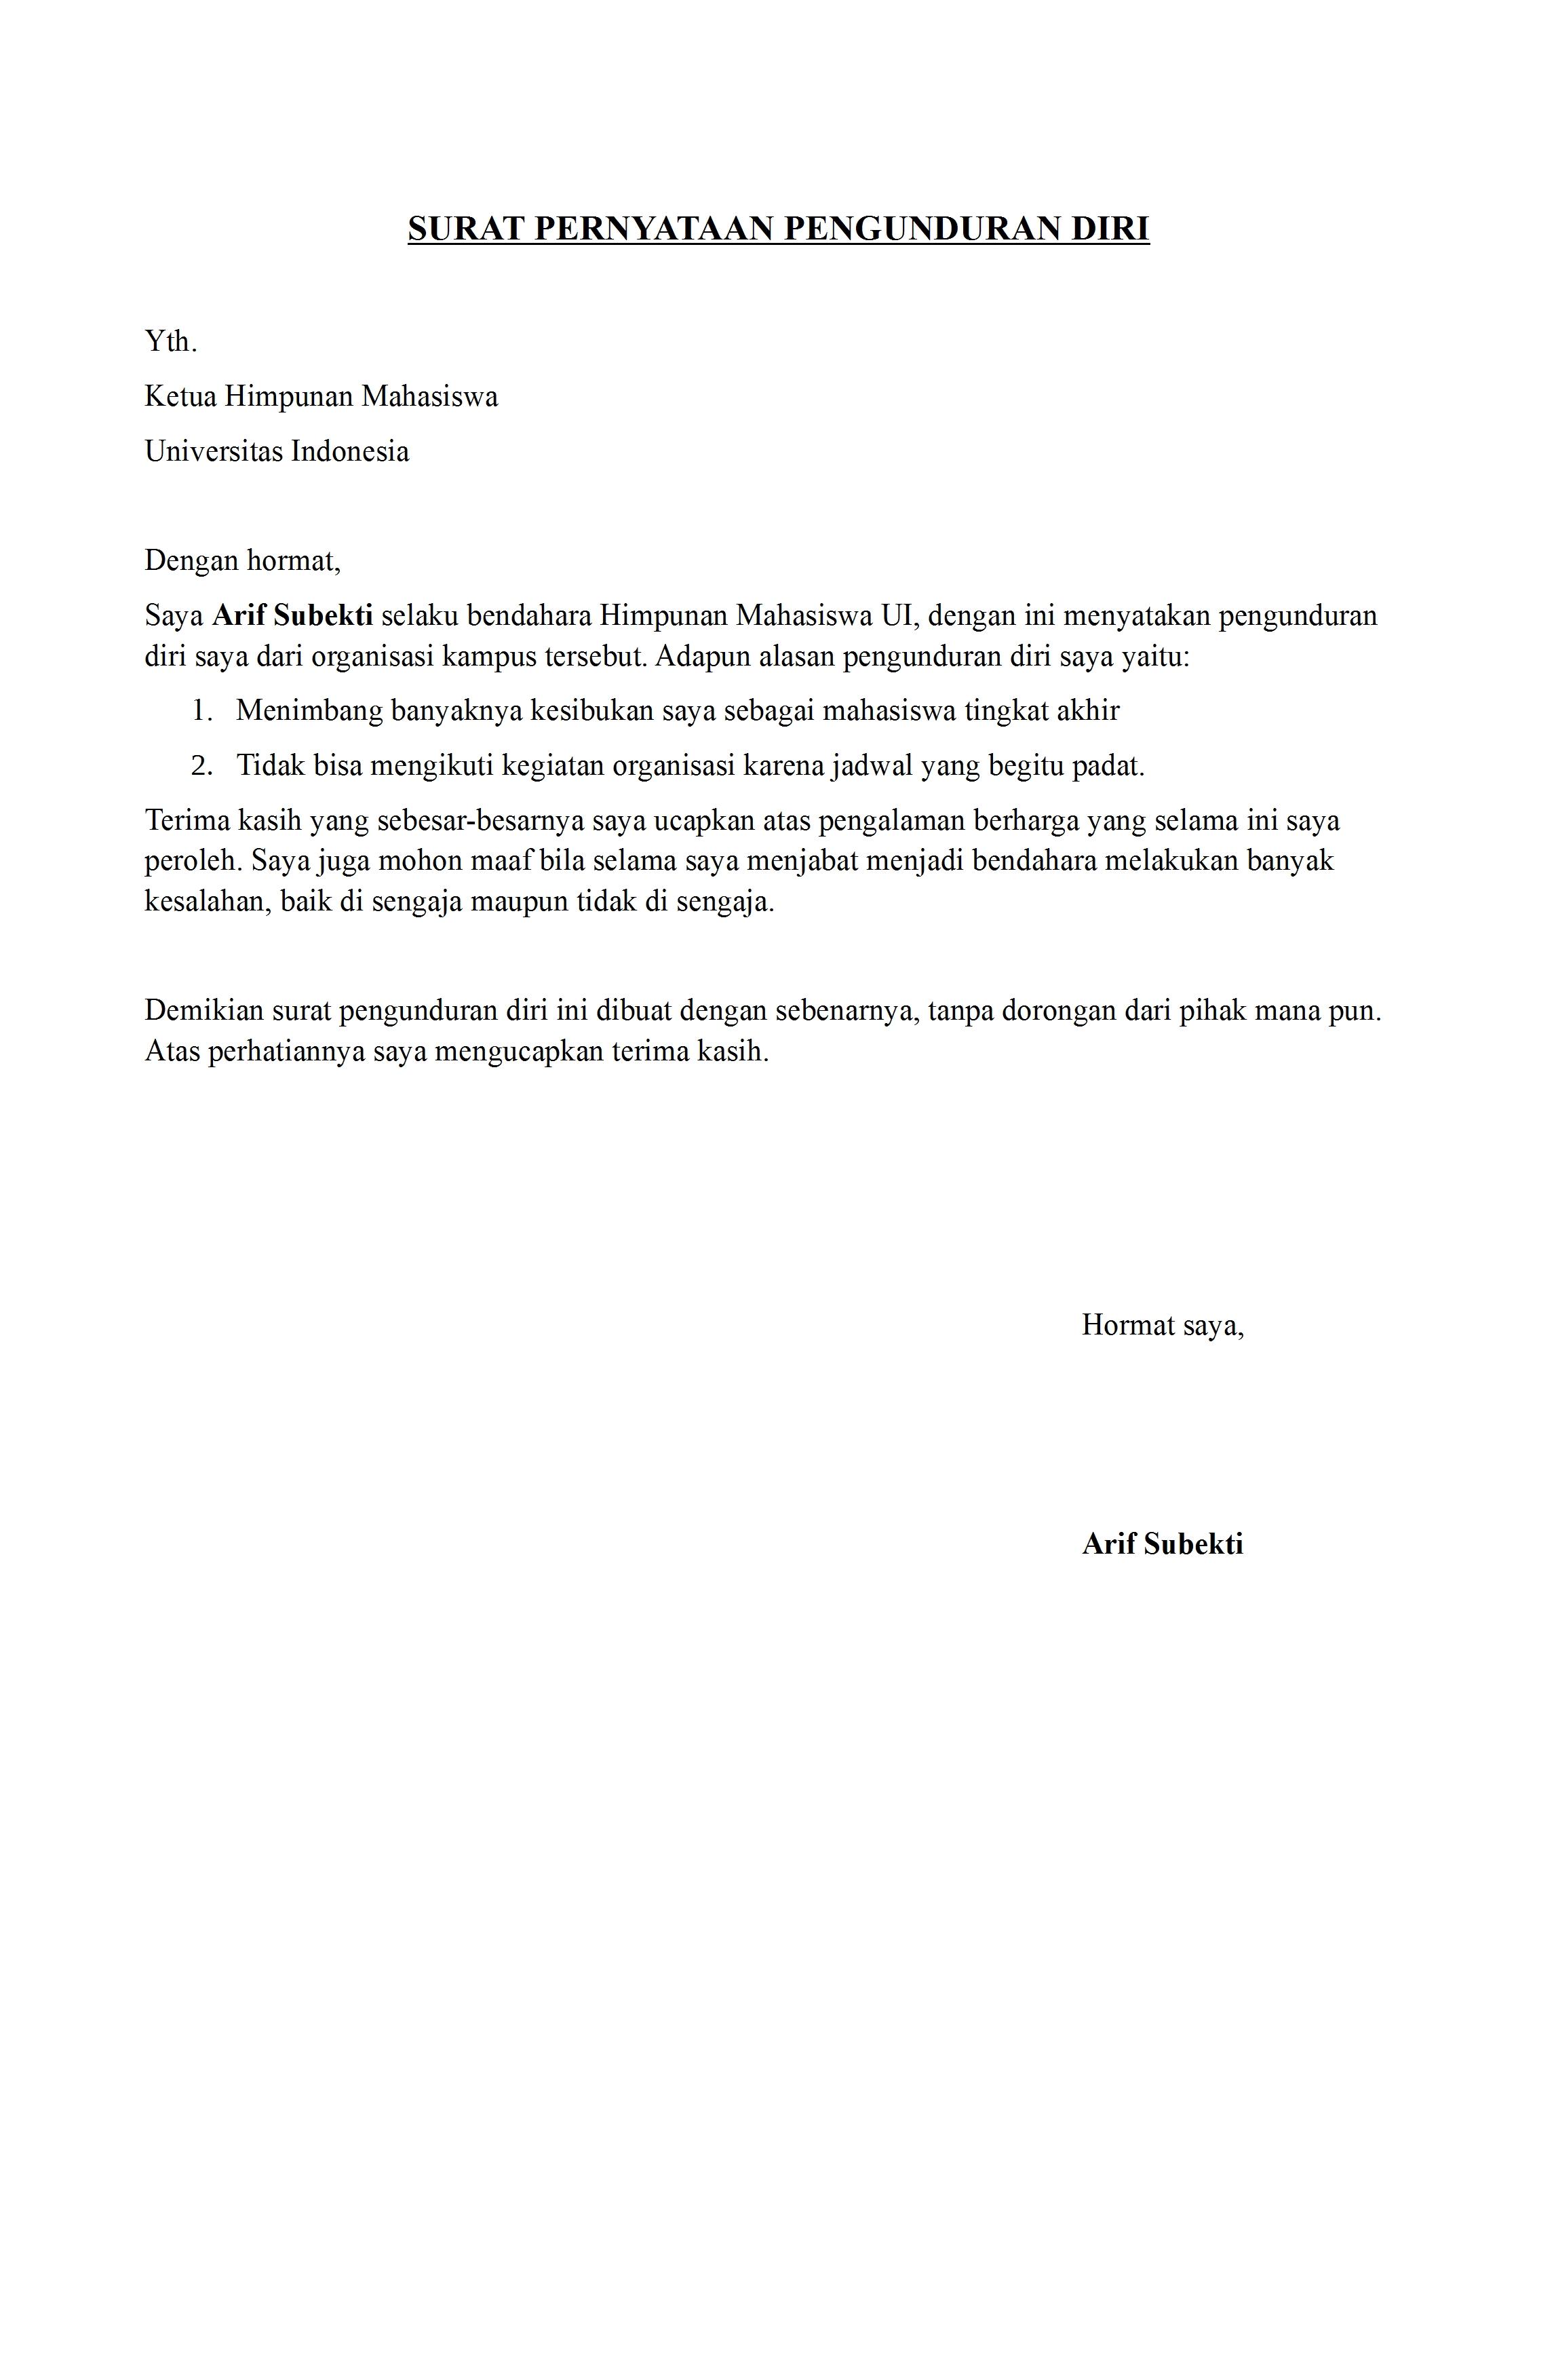 Contoh Surat Pengunduran Diri Sebagai Bendahara Sekolah Download Kumpulan Gambar